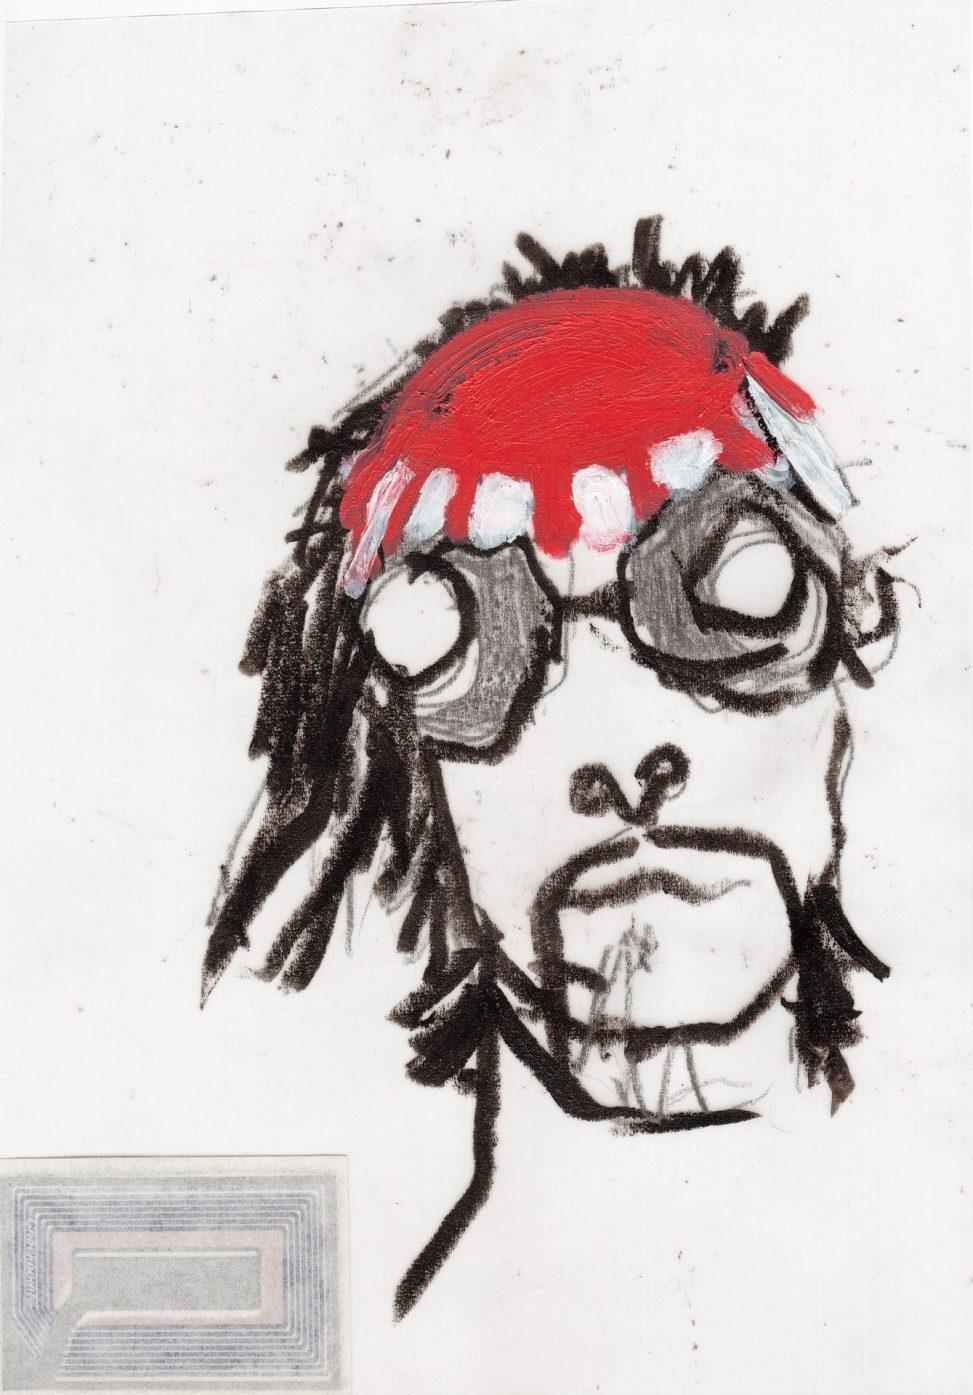 Il Coccodeista (self-portrait with Pechan prisms)